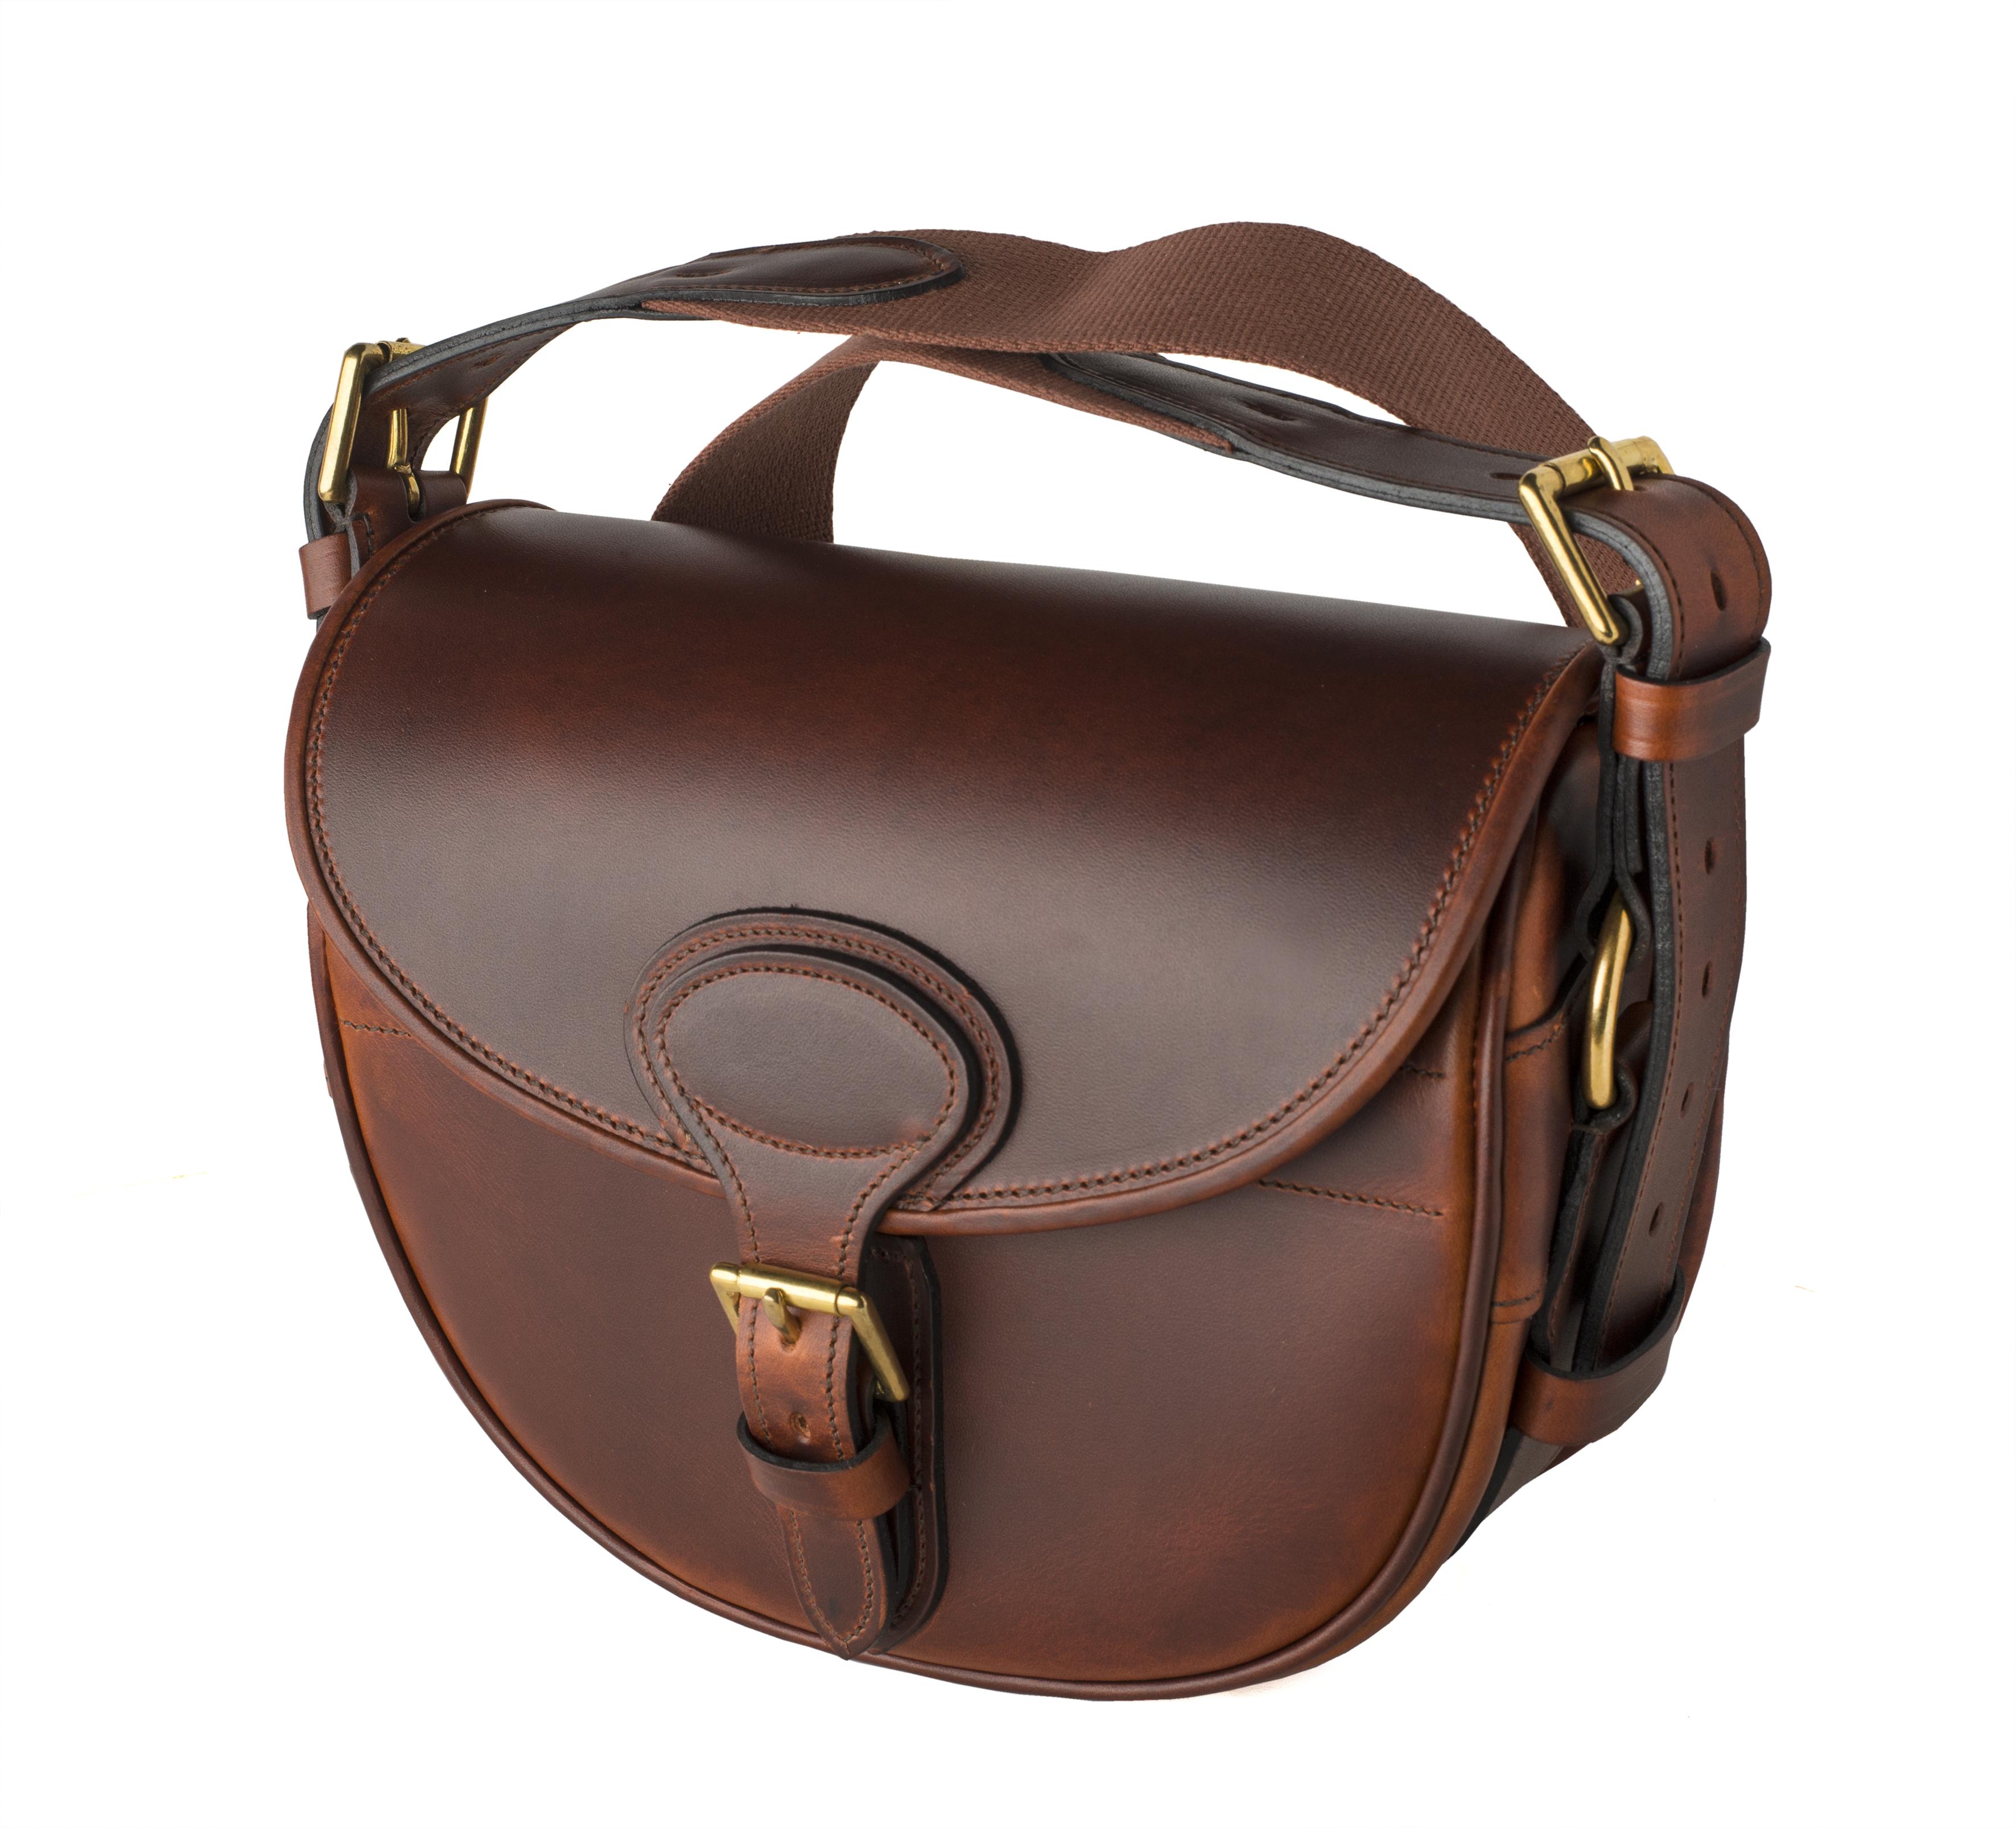 Rigby Leather Cartridge Bag - John Rigby   Co.